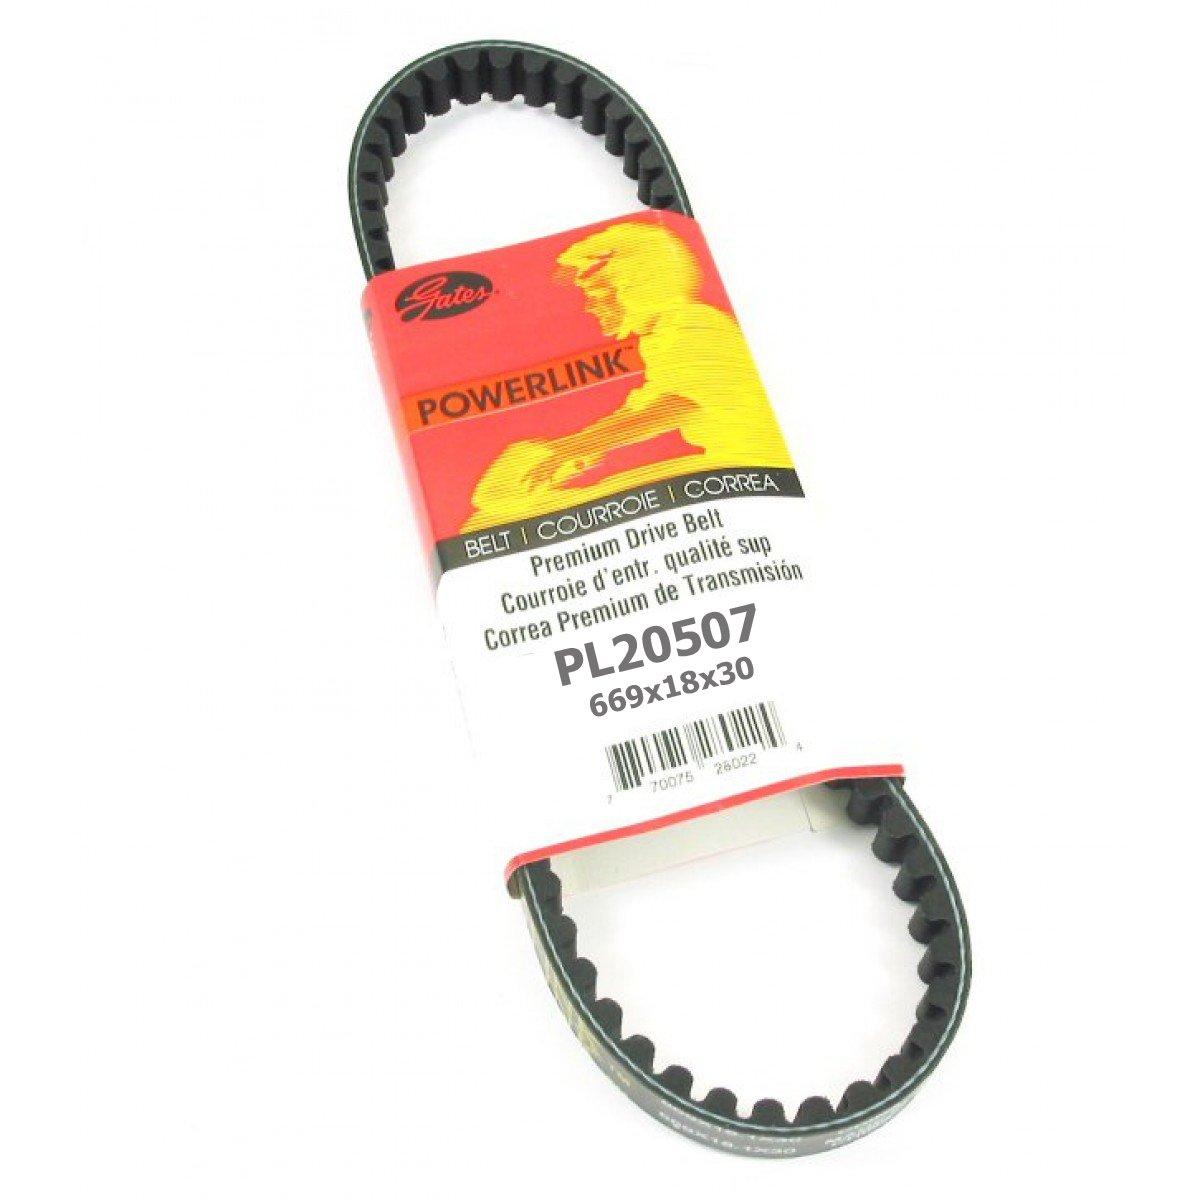 Gates Powerlink PL20507 replaces 669 18 30 Standard CVT Drive Belt 49cc/50cc GY6 QMB139 4 stroke Engines